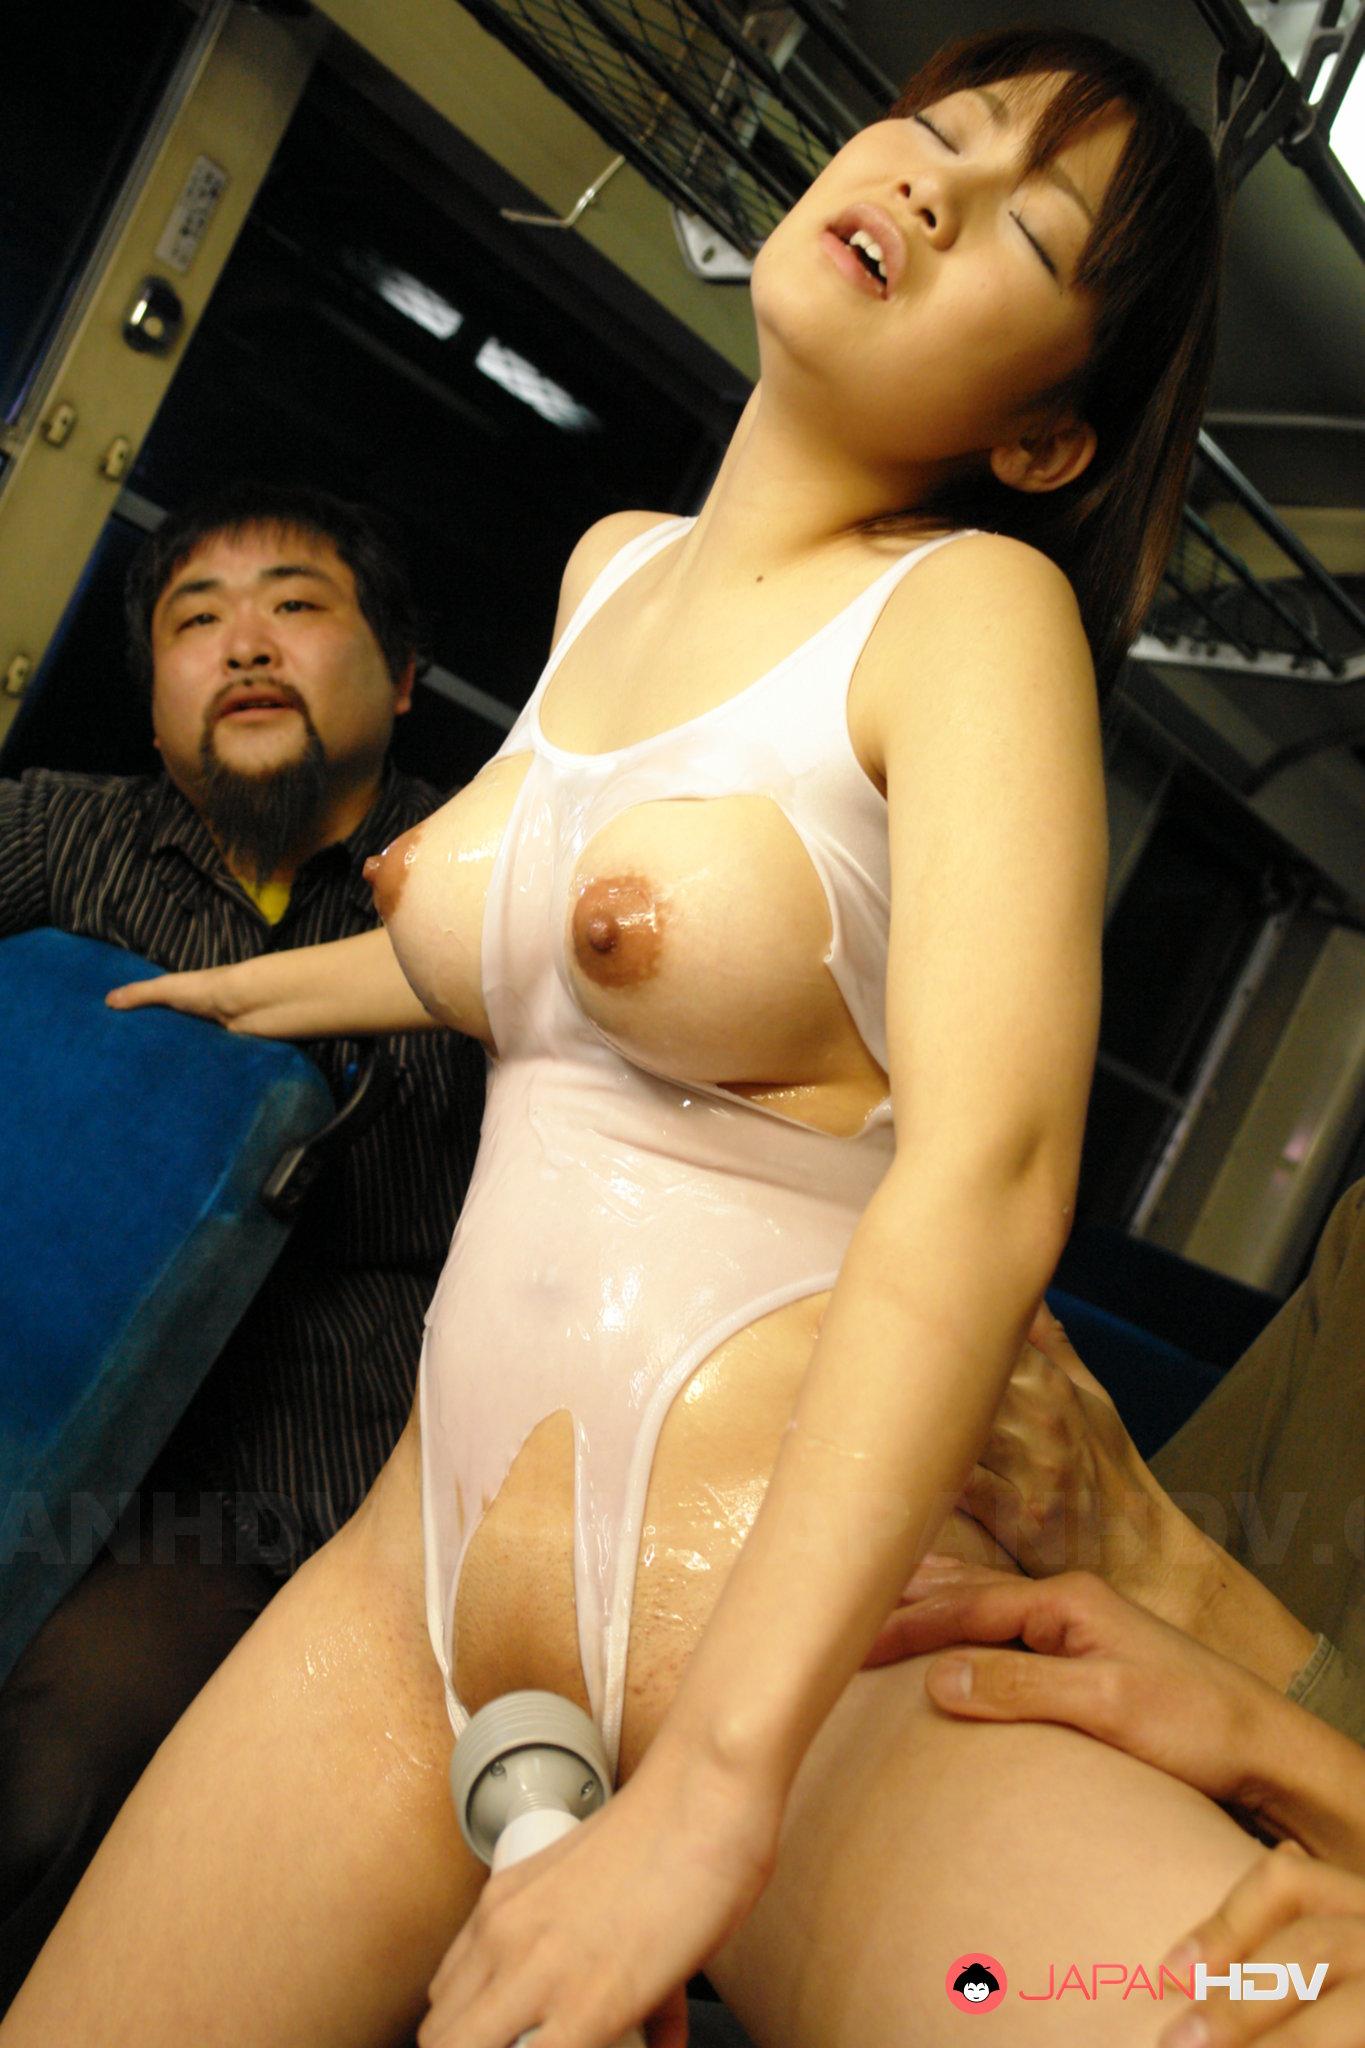 Asian Porn On A Bus horny yayoi yoshino uses a vibrator on bus